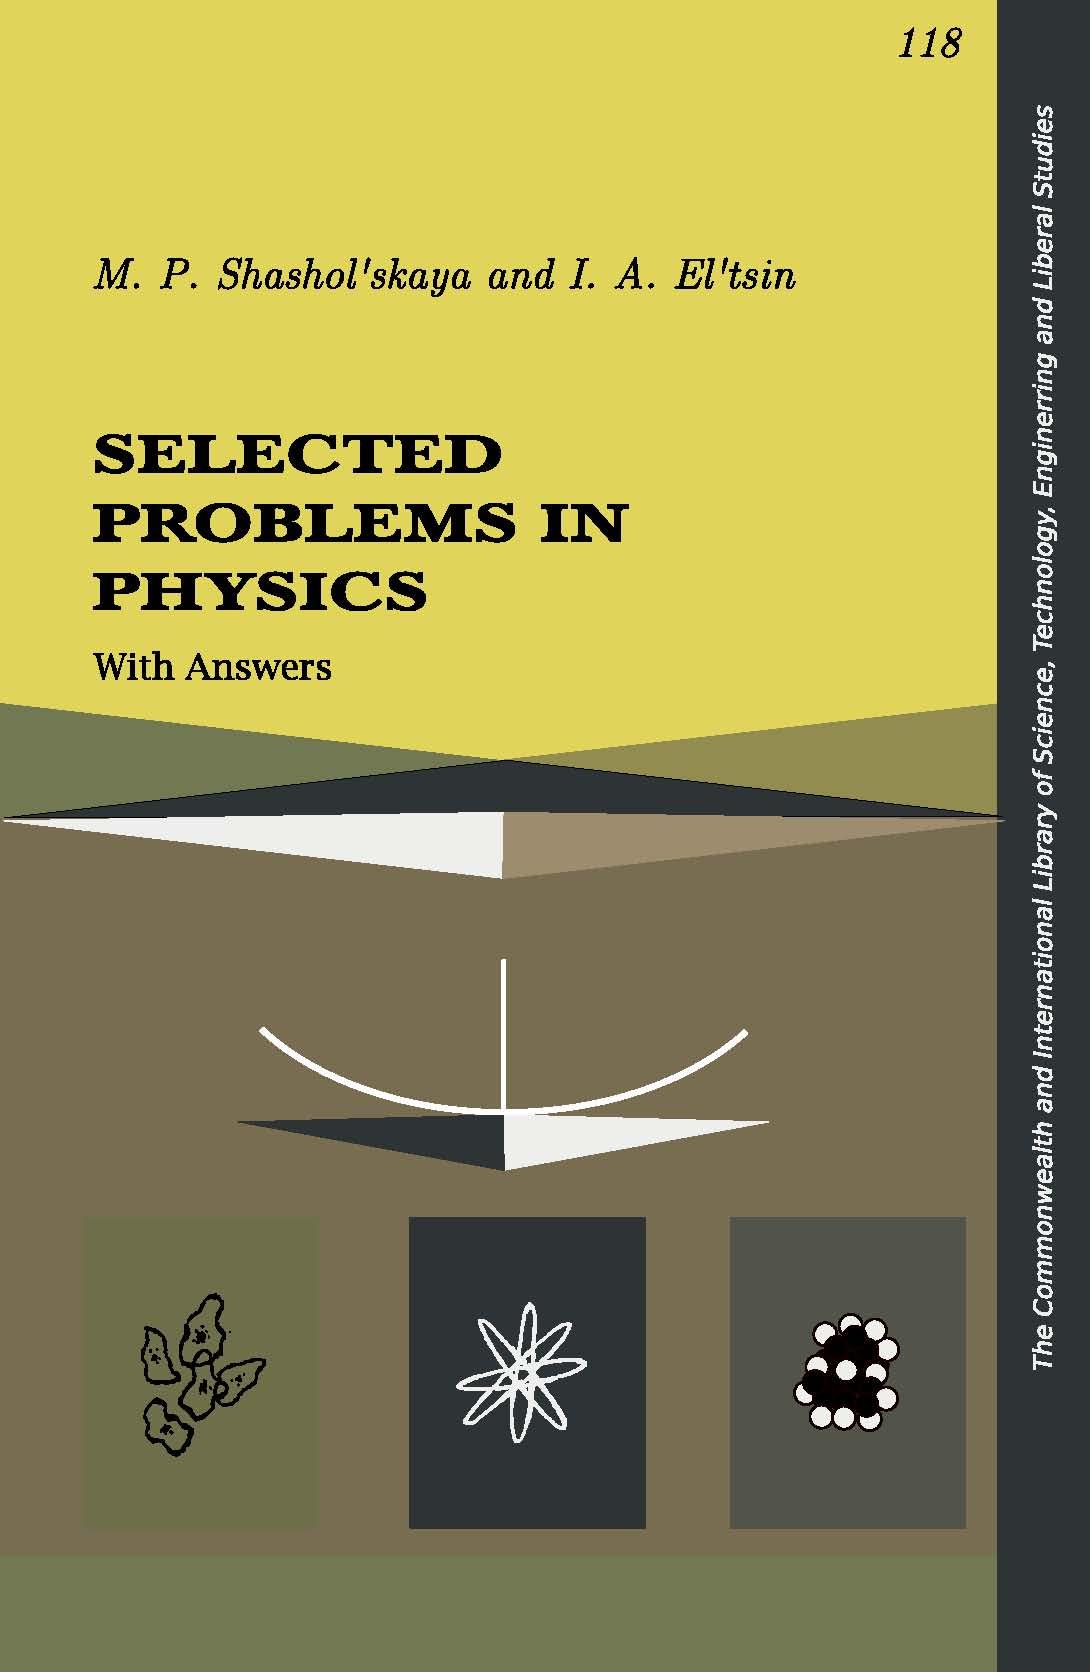 Selected Problems In Physics Shaskol Skaya And El Tsin